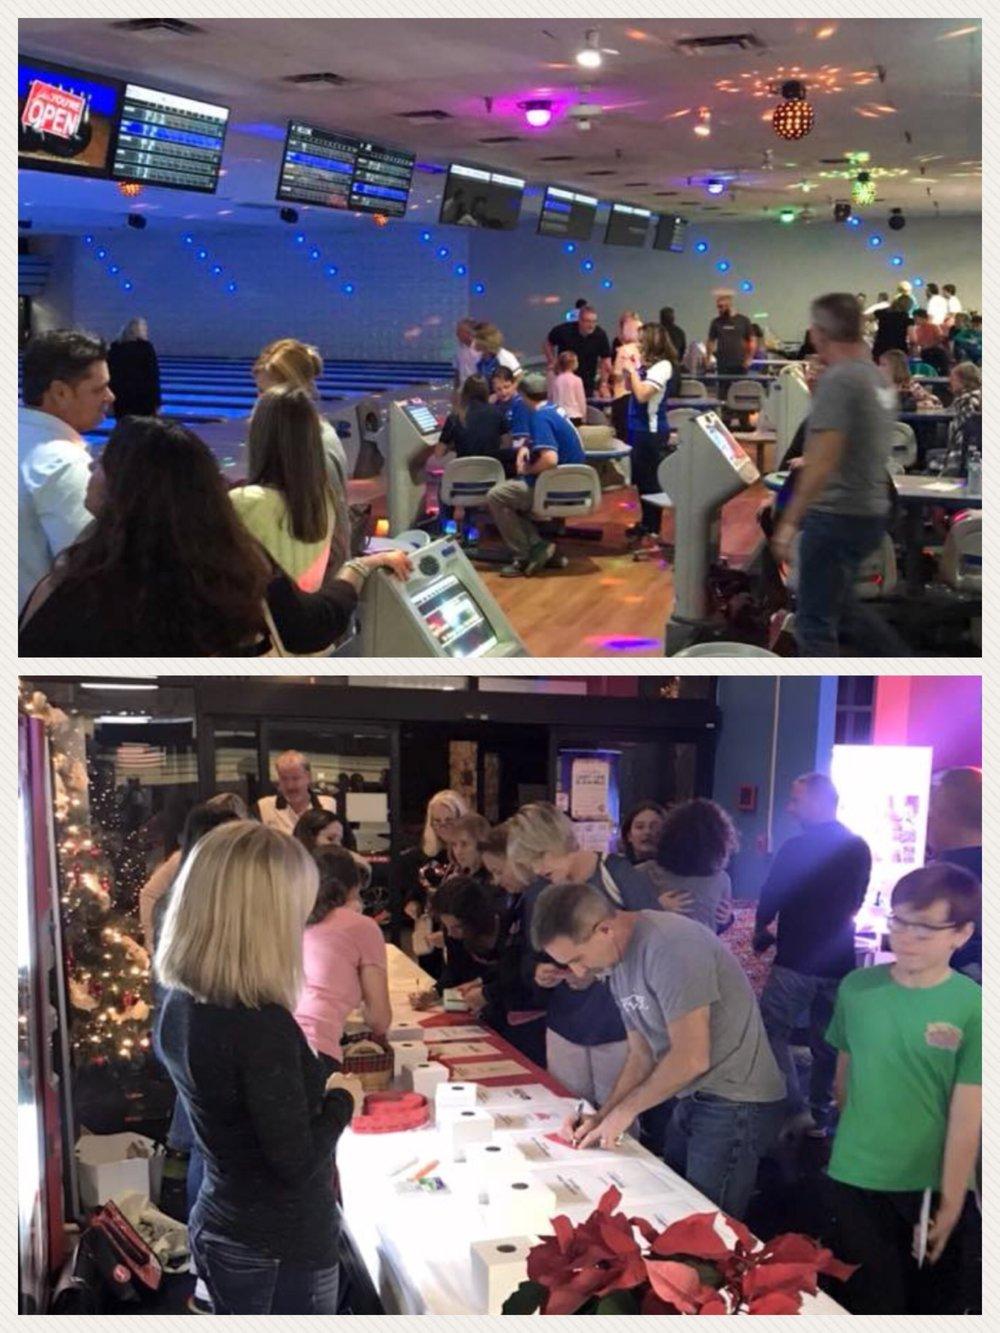 LTW bowl event pic.jpg